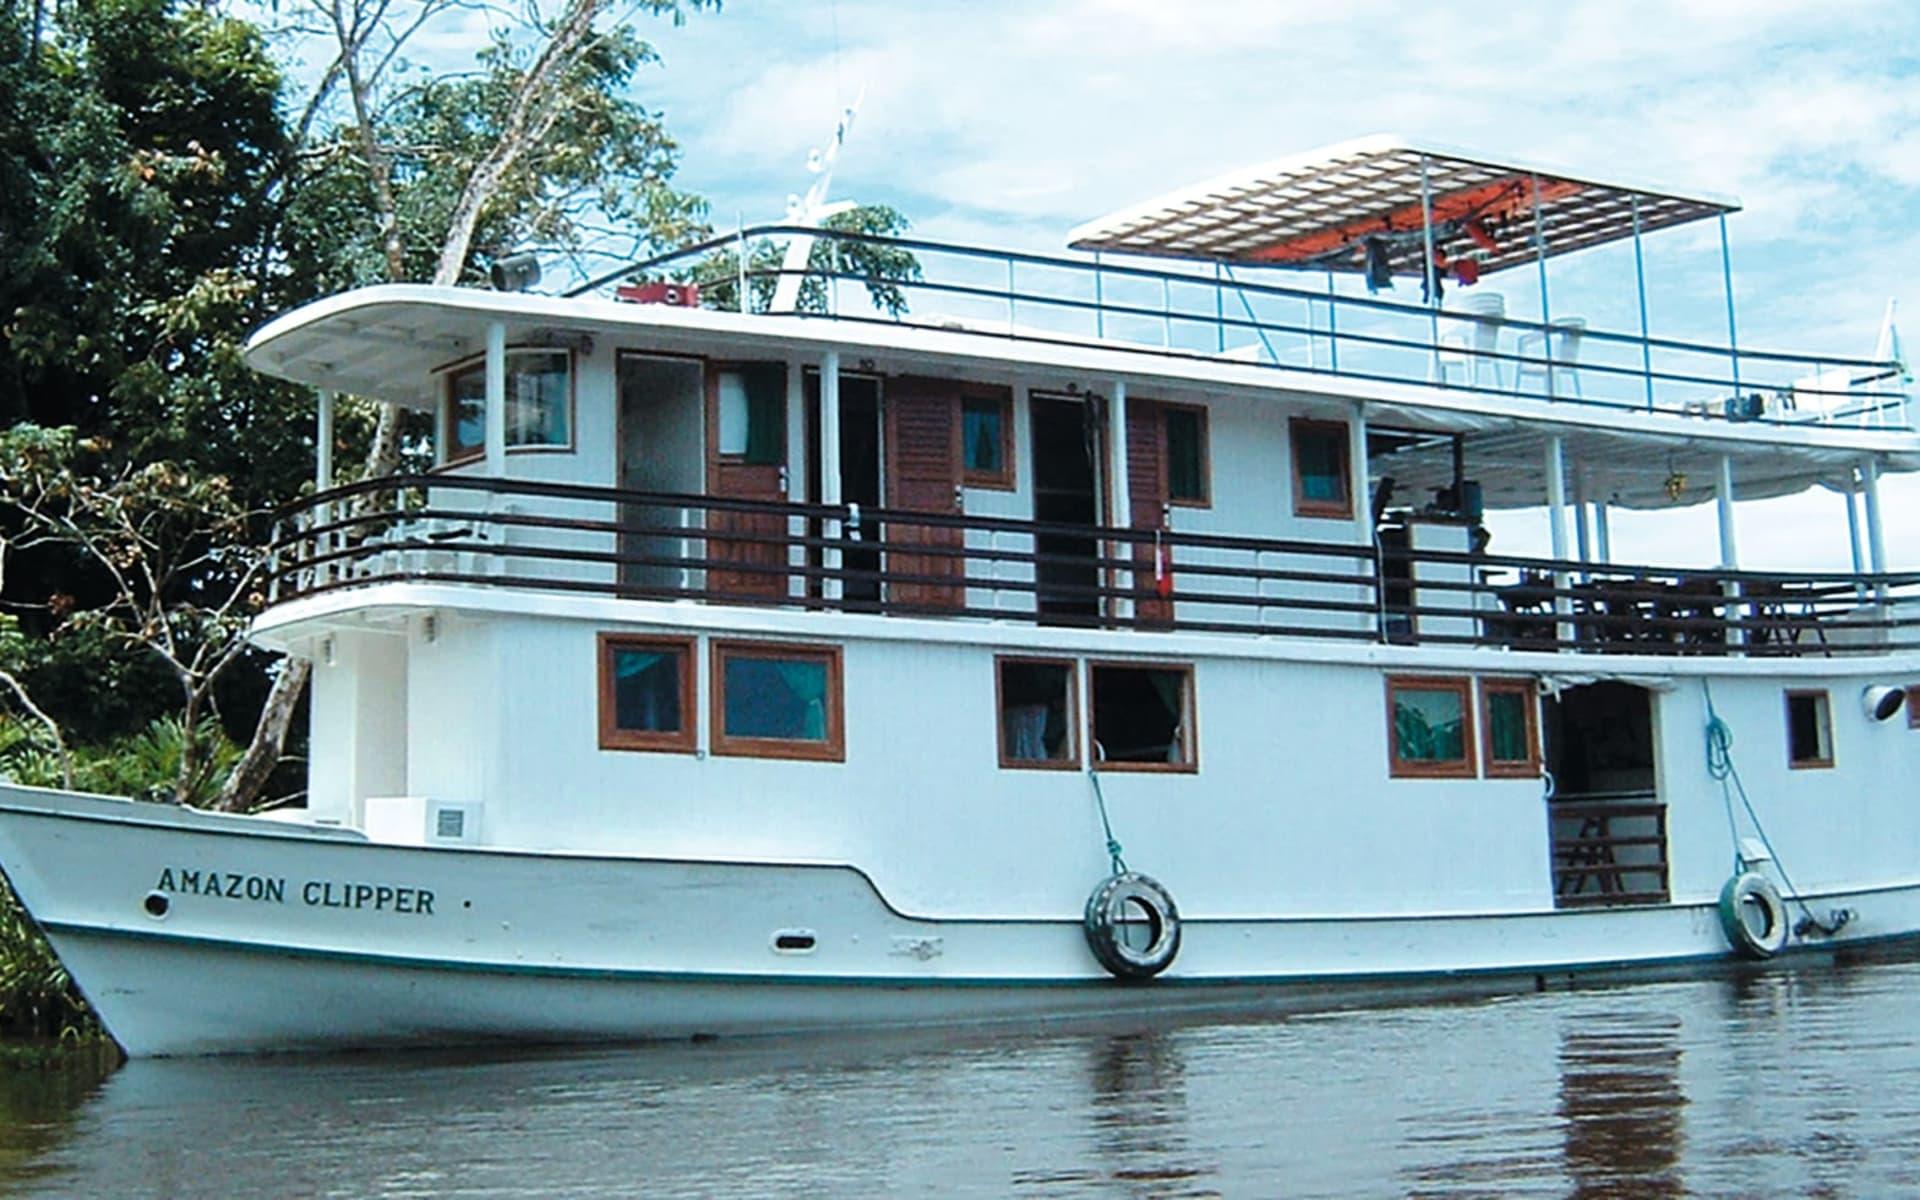 Flussfahrt Amazon Clipper Cruises / Amazonas River ab Manaus: exterior: Amazon Clipper Cruises - Amazon Clipper